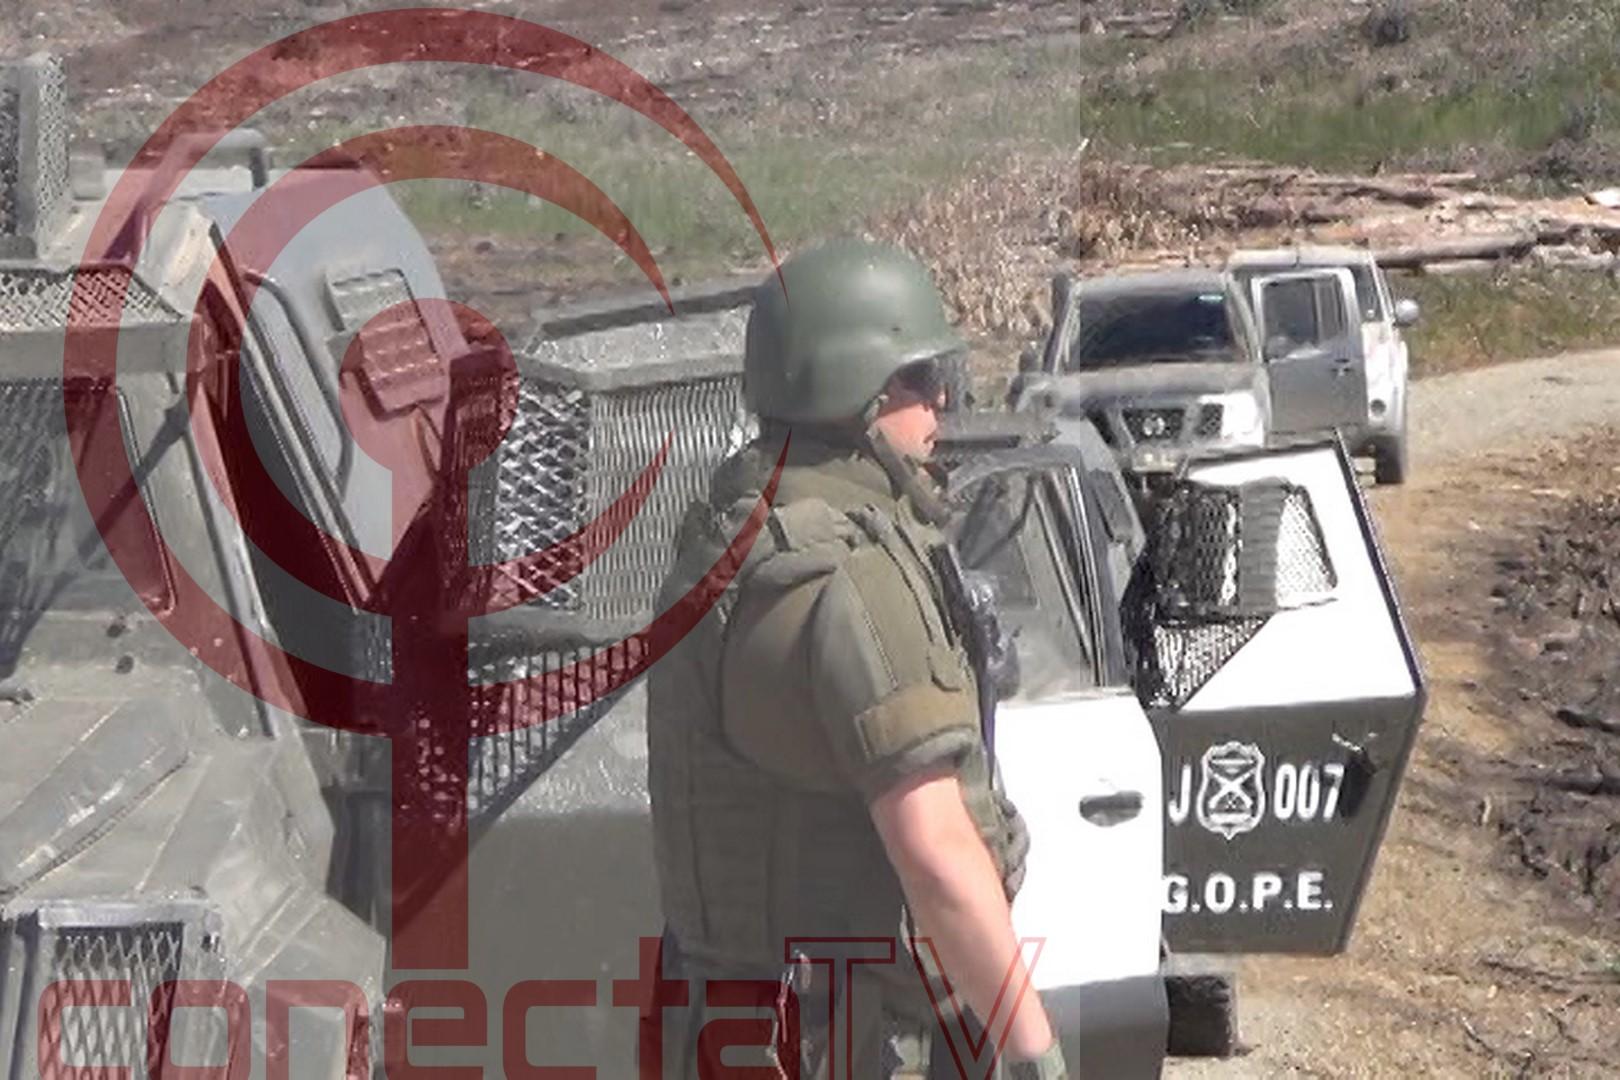 Encapuchados robaron dos camionetas a trabajadores que instalaban antena en Curapaillaco